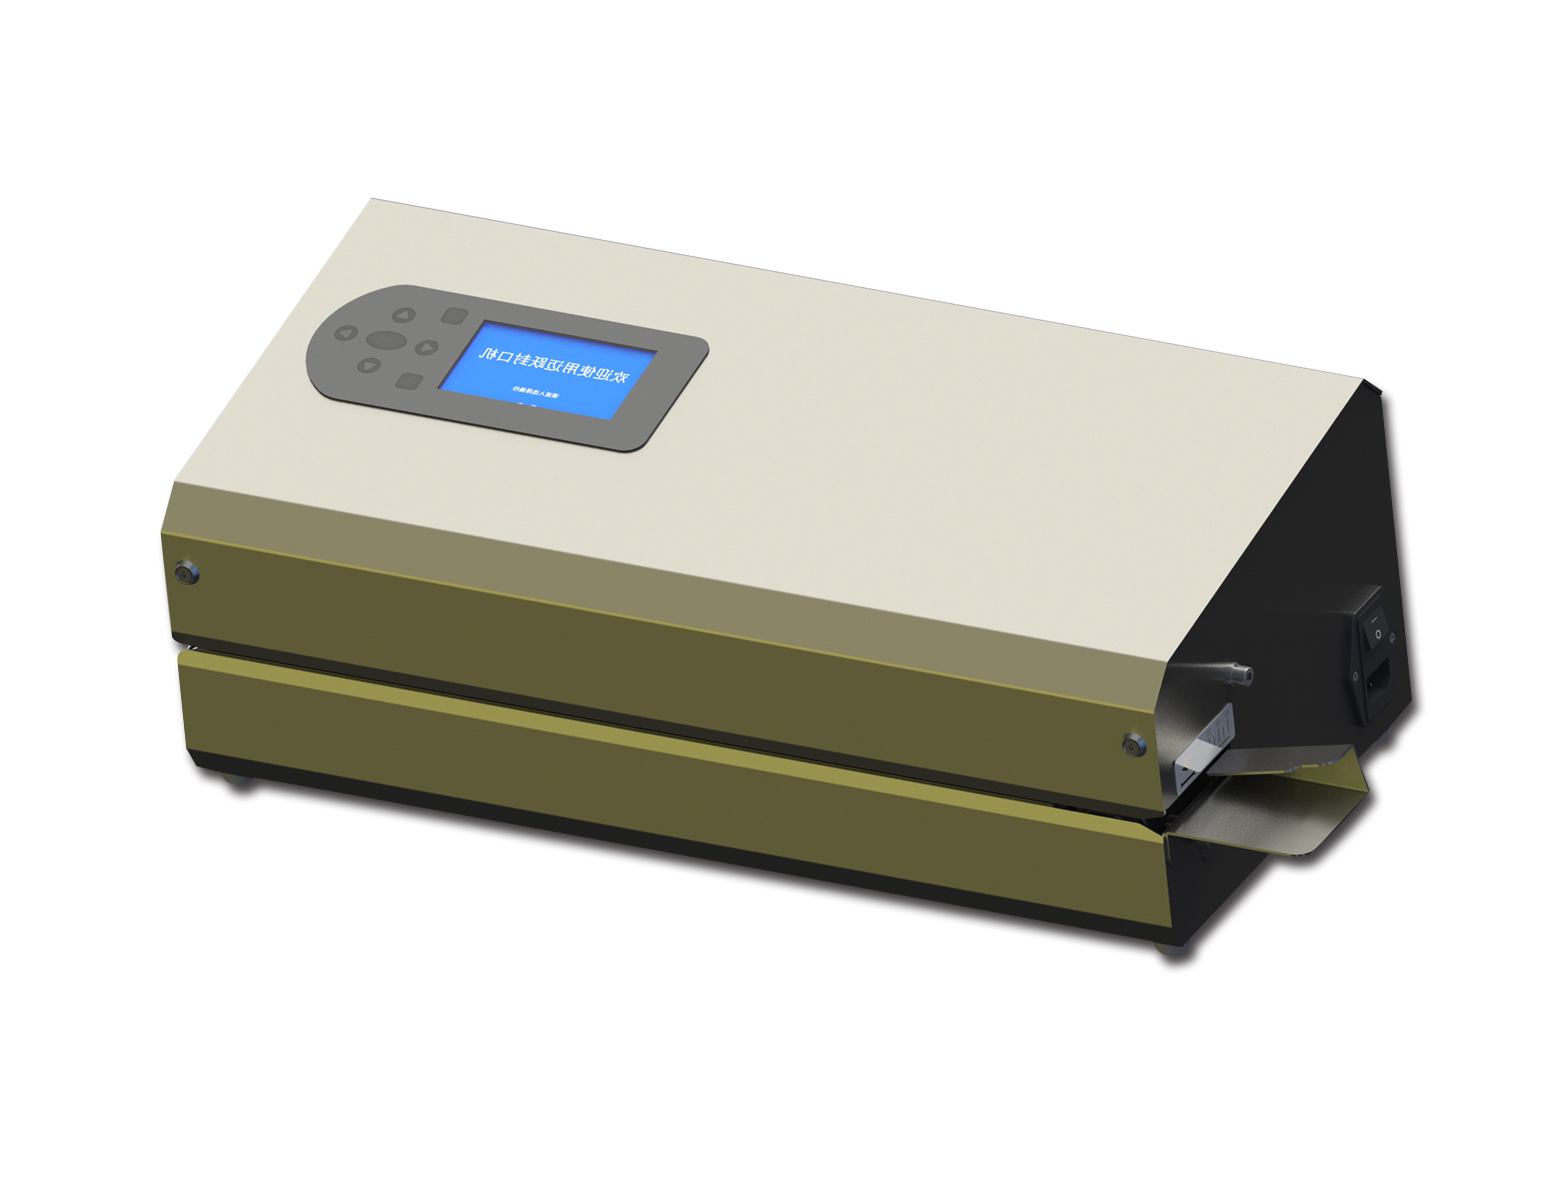 HJFK-880型连续型打印封口机